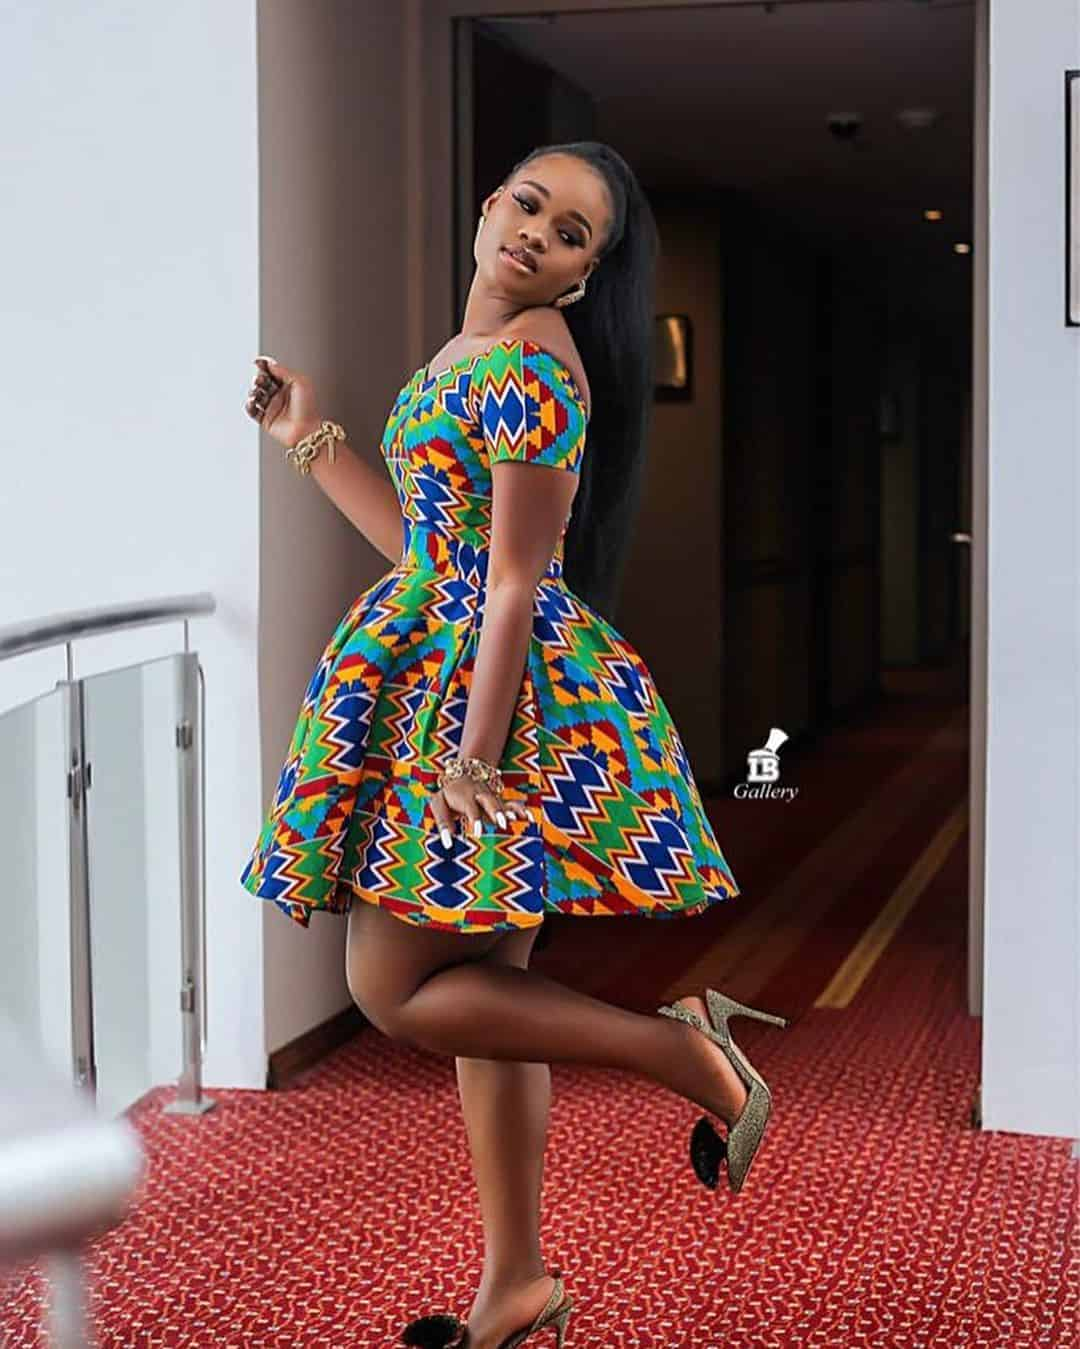 Ankara Styles 125 Kente Special: 45 Ankara Short Gown Styles Designs 2019 (Updated Weekly